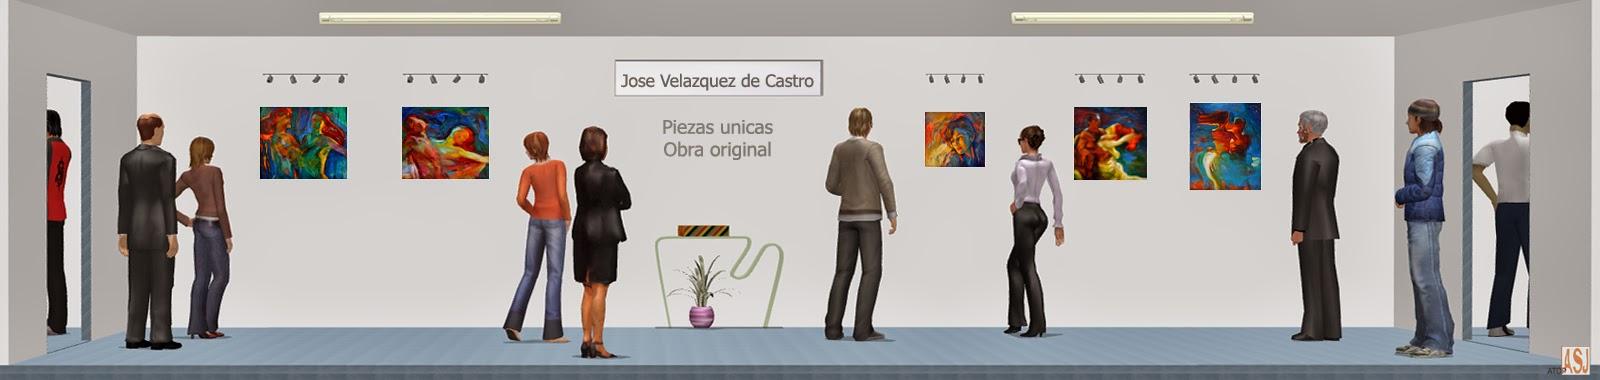 "<img src=""http://1.bp.blogspot.com/-wlhSNmYqf2E/U2TWJXKRUjI/AAAAAAAAYIE/0pwtCj2YH8c/s1600/sala_de_jose_velazquez_de_castro.jpg"" alt=""sala de exposición virtual de pinturas de José Velázquez de Castro""/>"